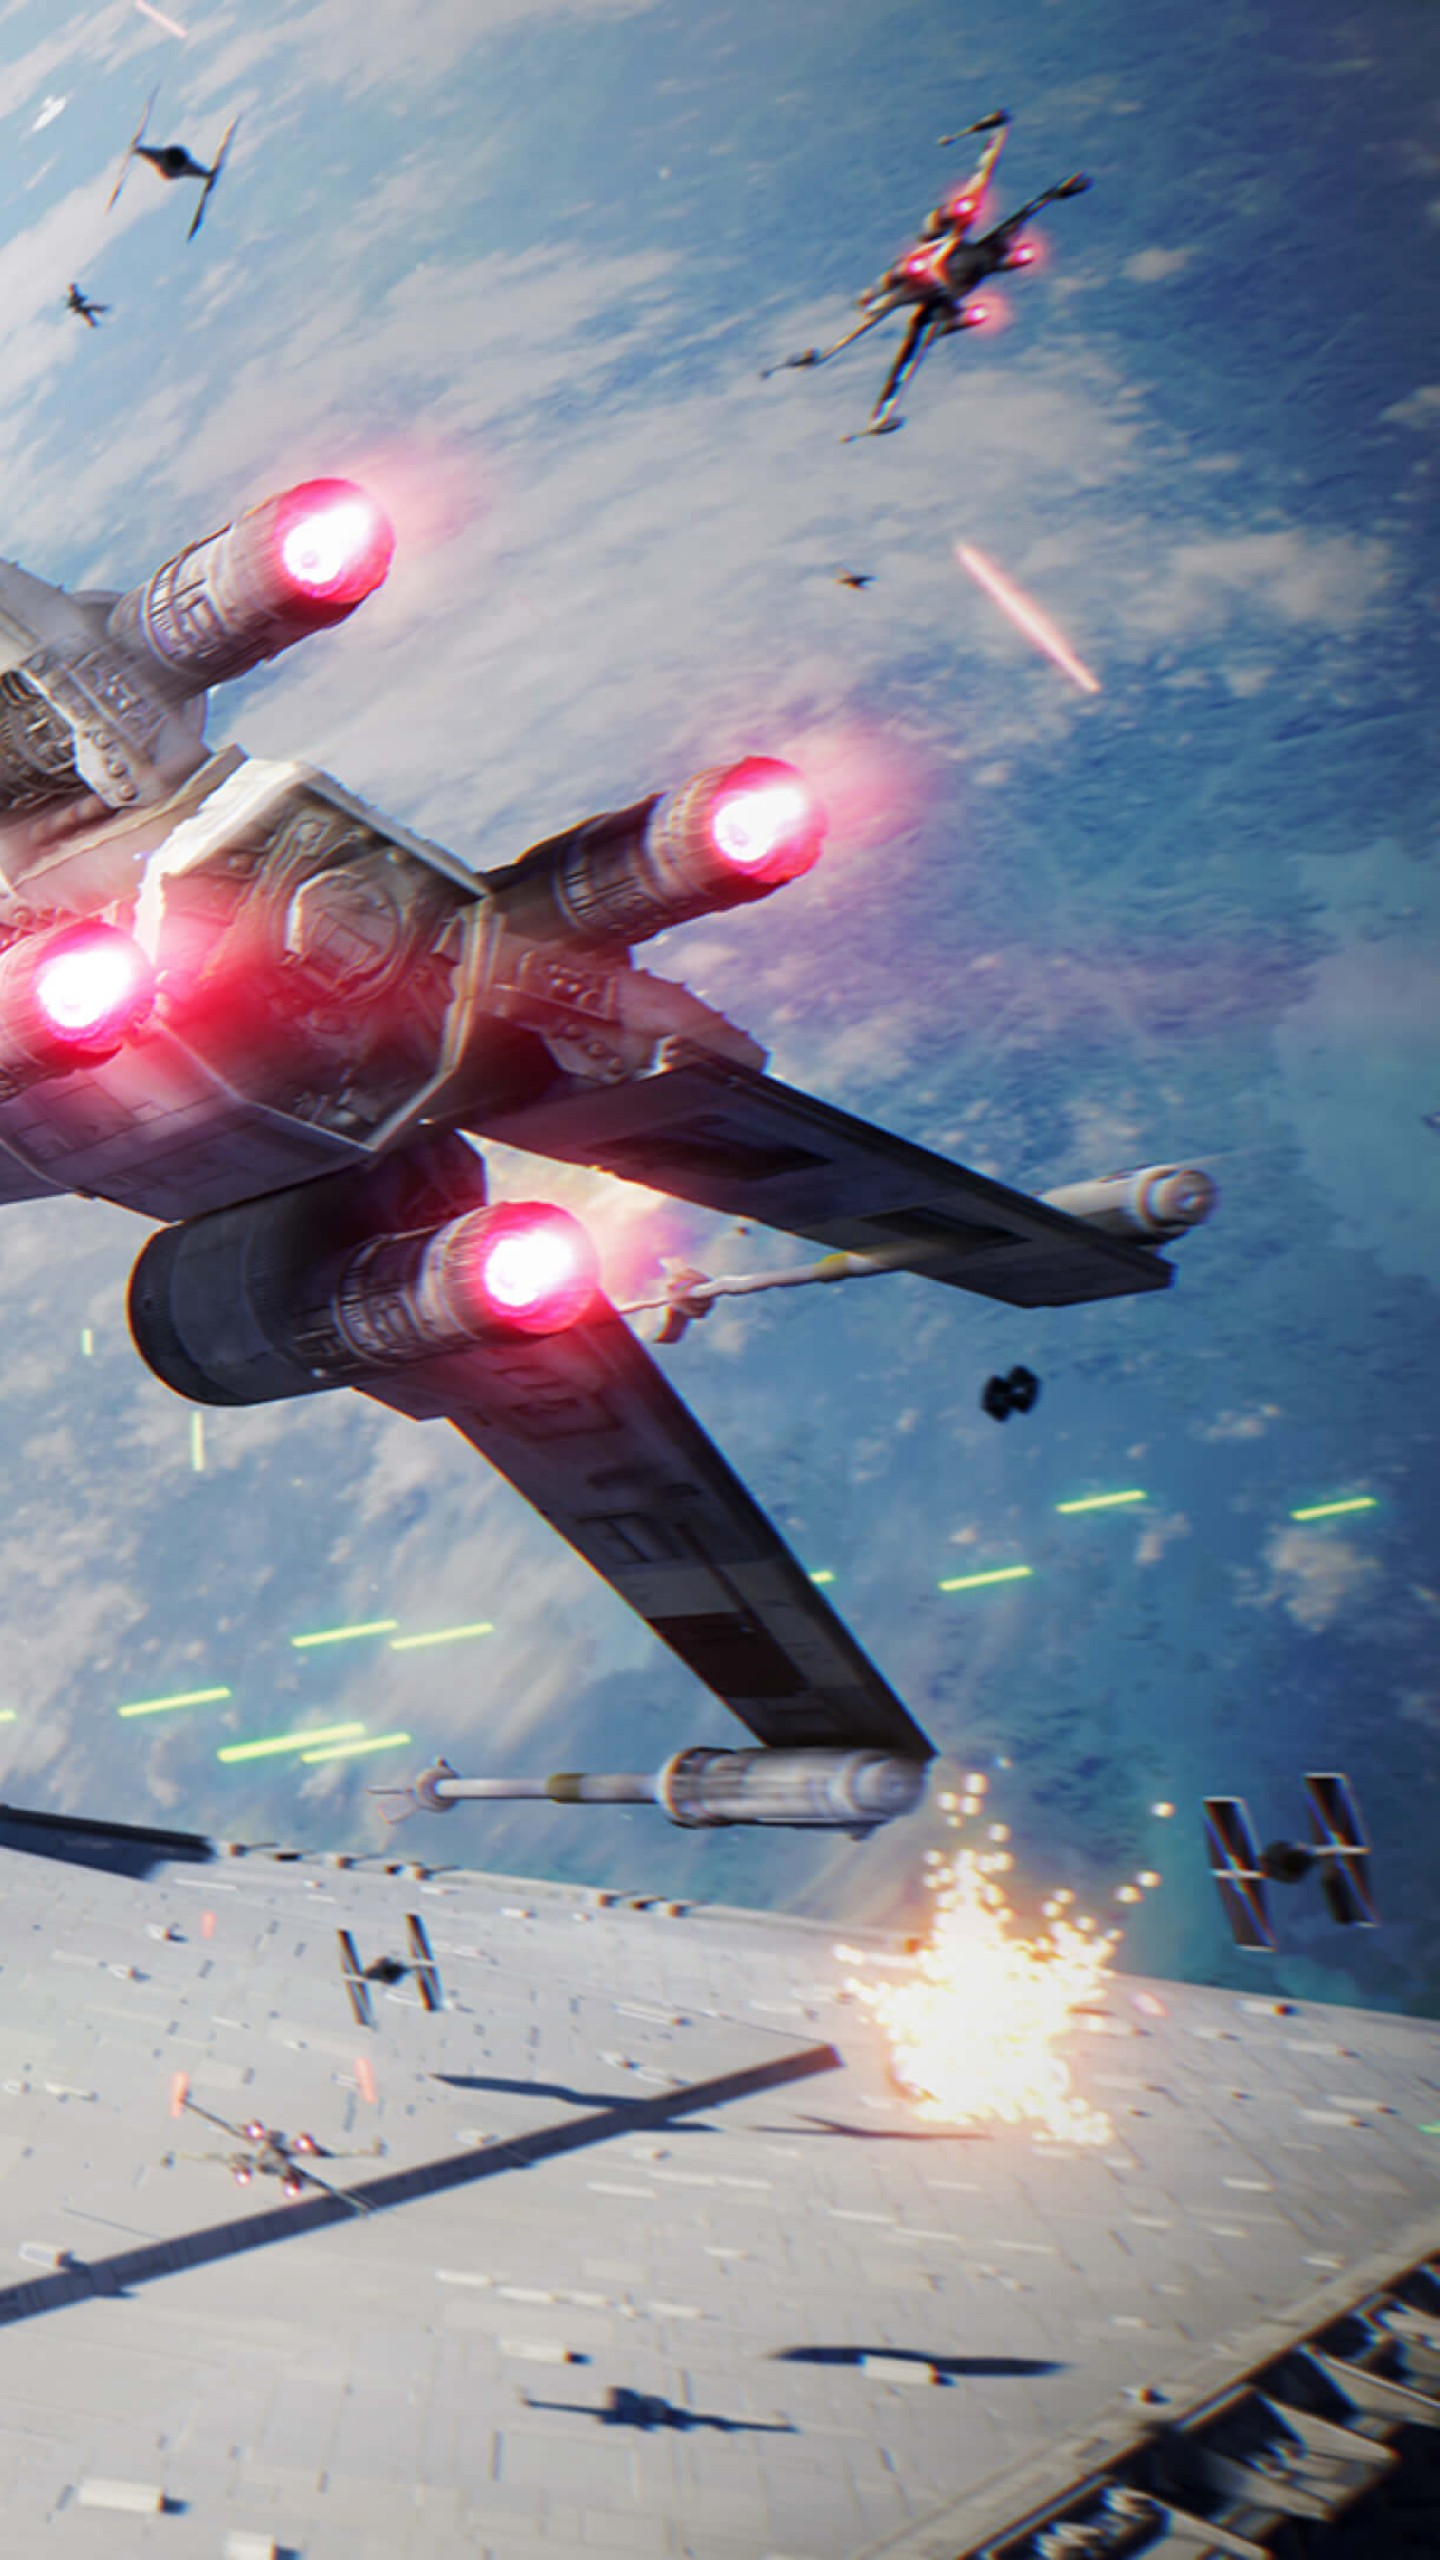 star wars battlefront ii 1440x2560 4k screenshot 13413